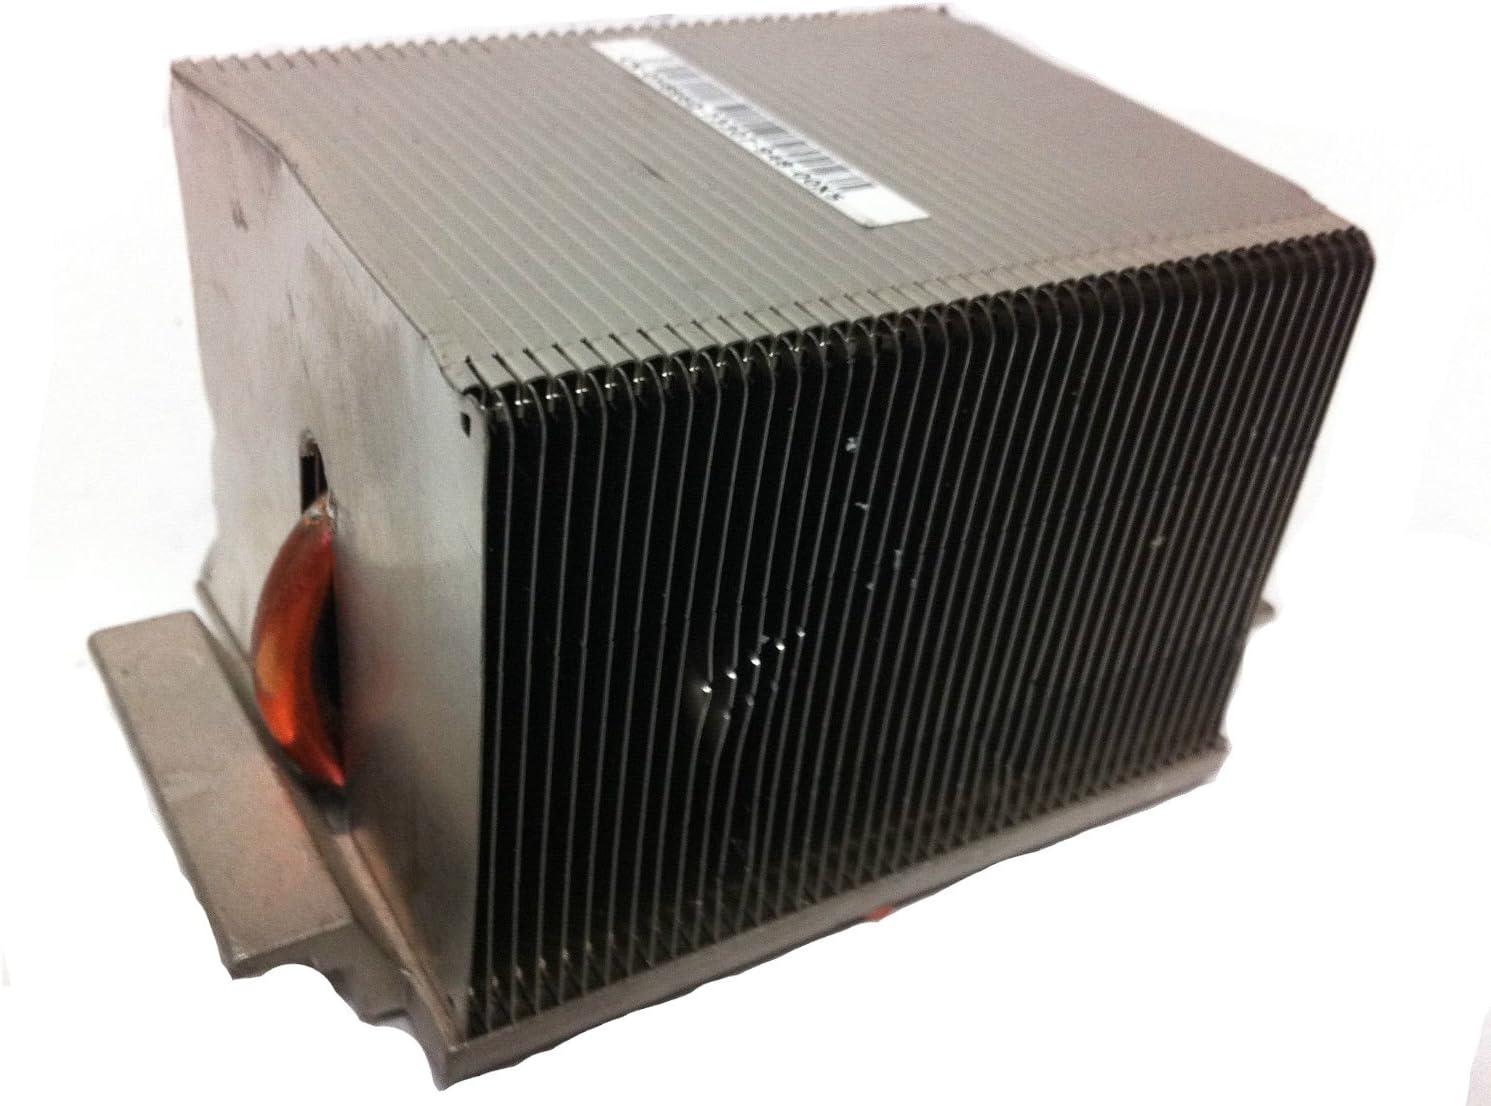 Shroud 0H895D Dell Optiplex 745 755 760 Heatsink